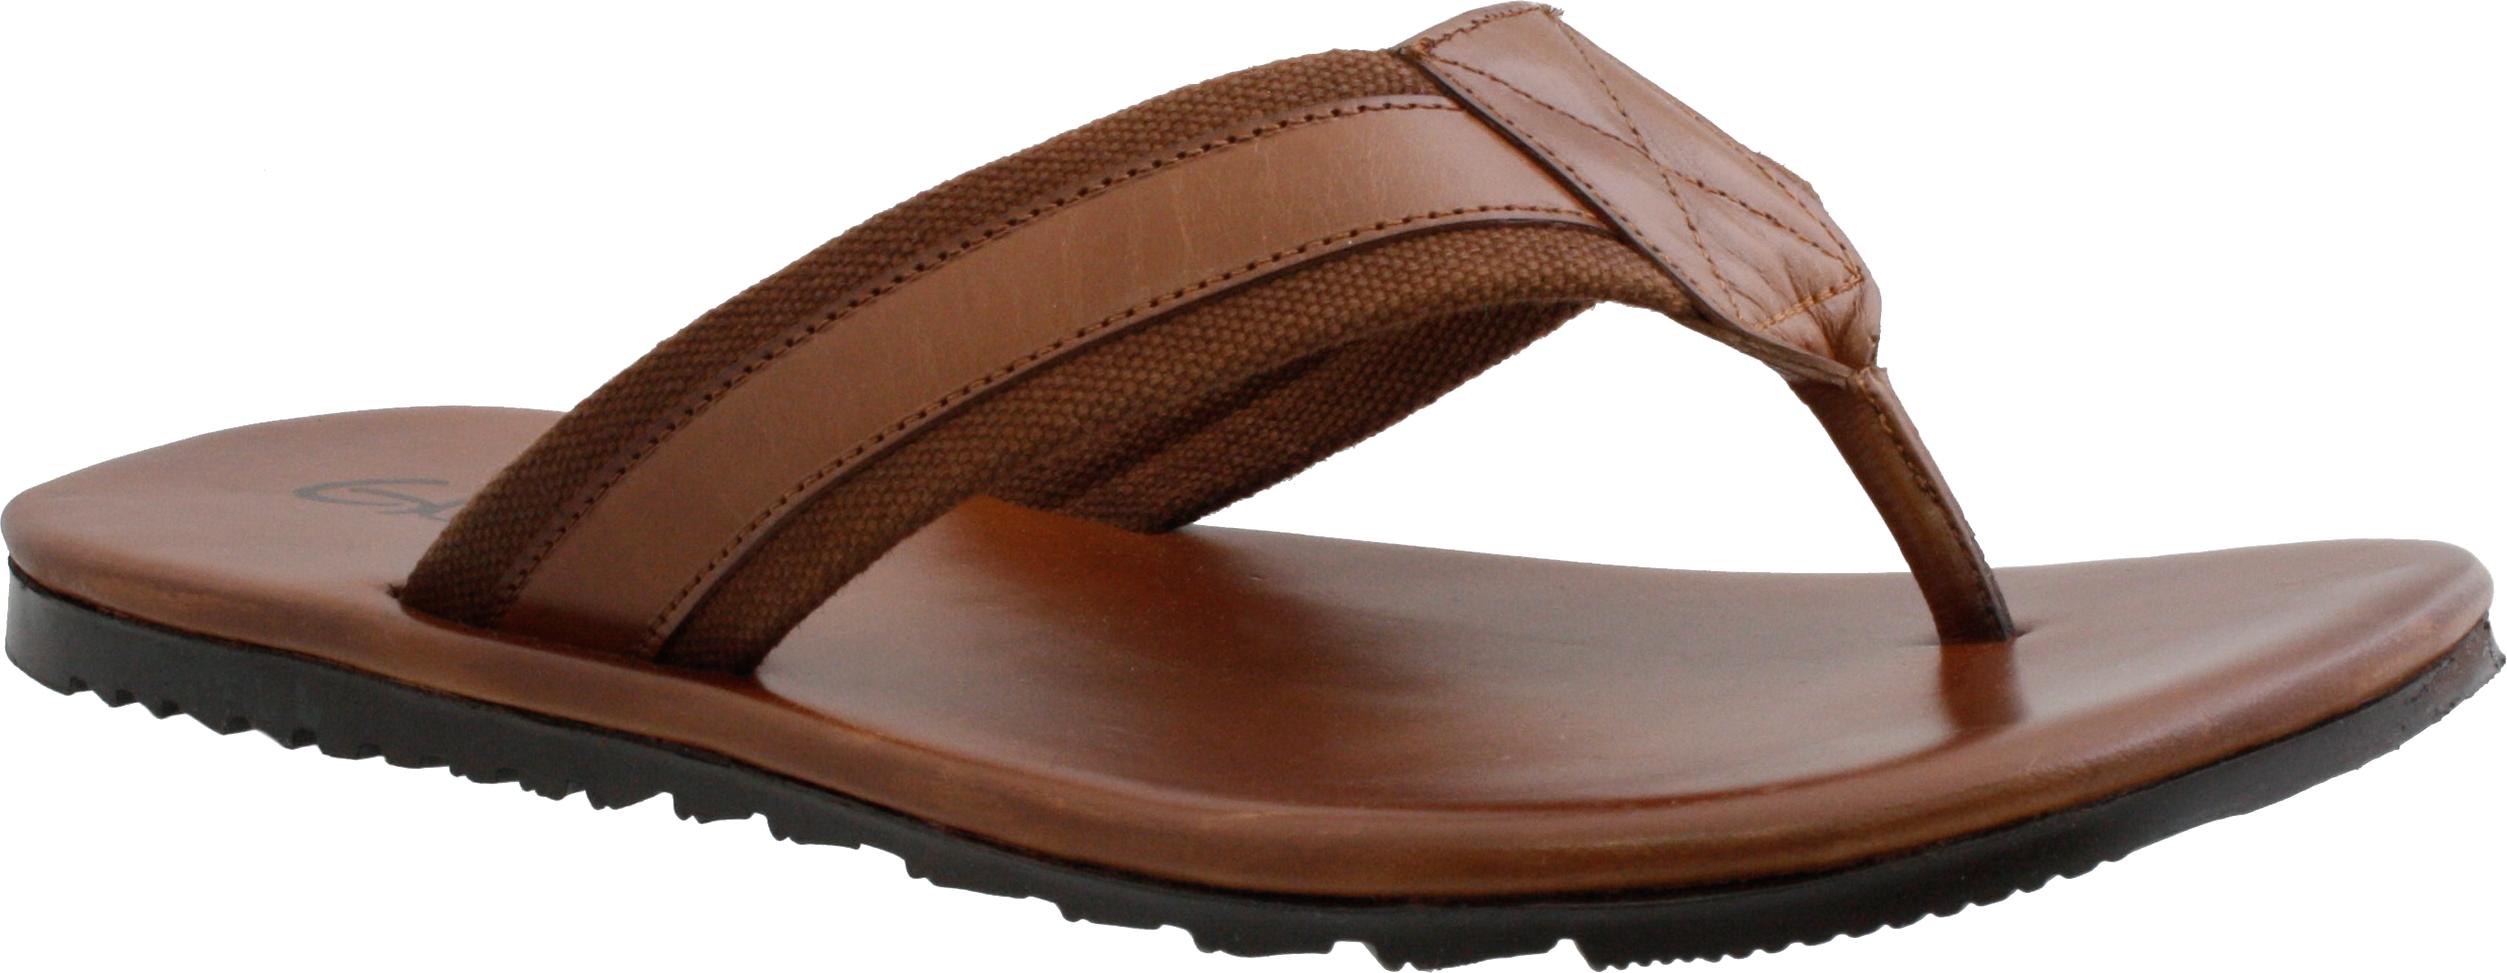 Sandals HD PNG - 118857